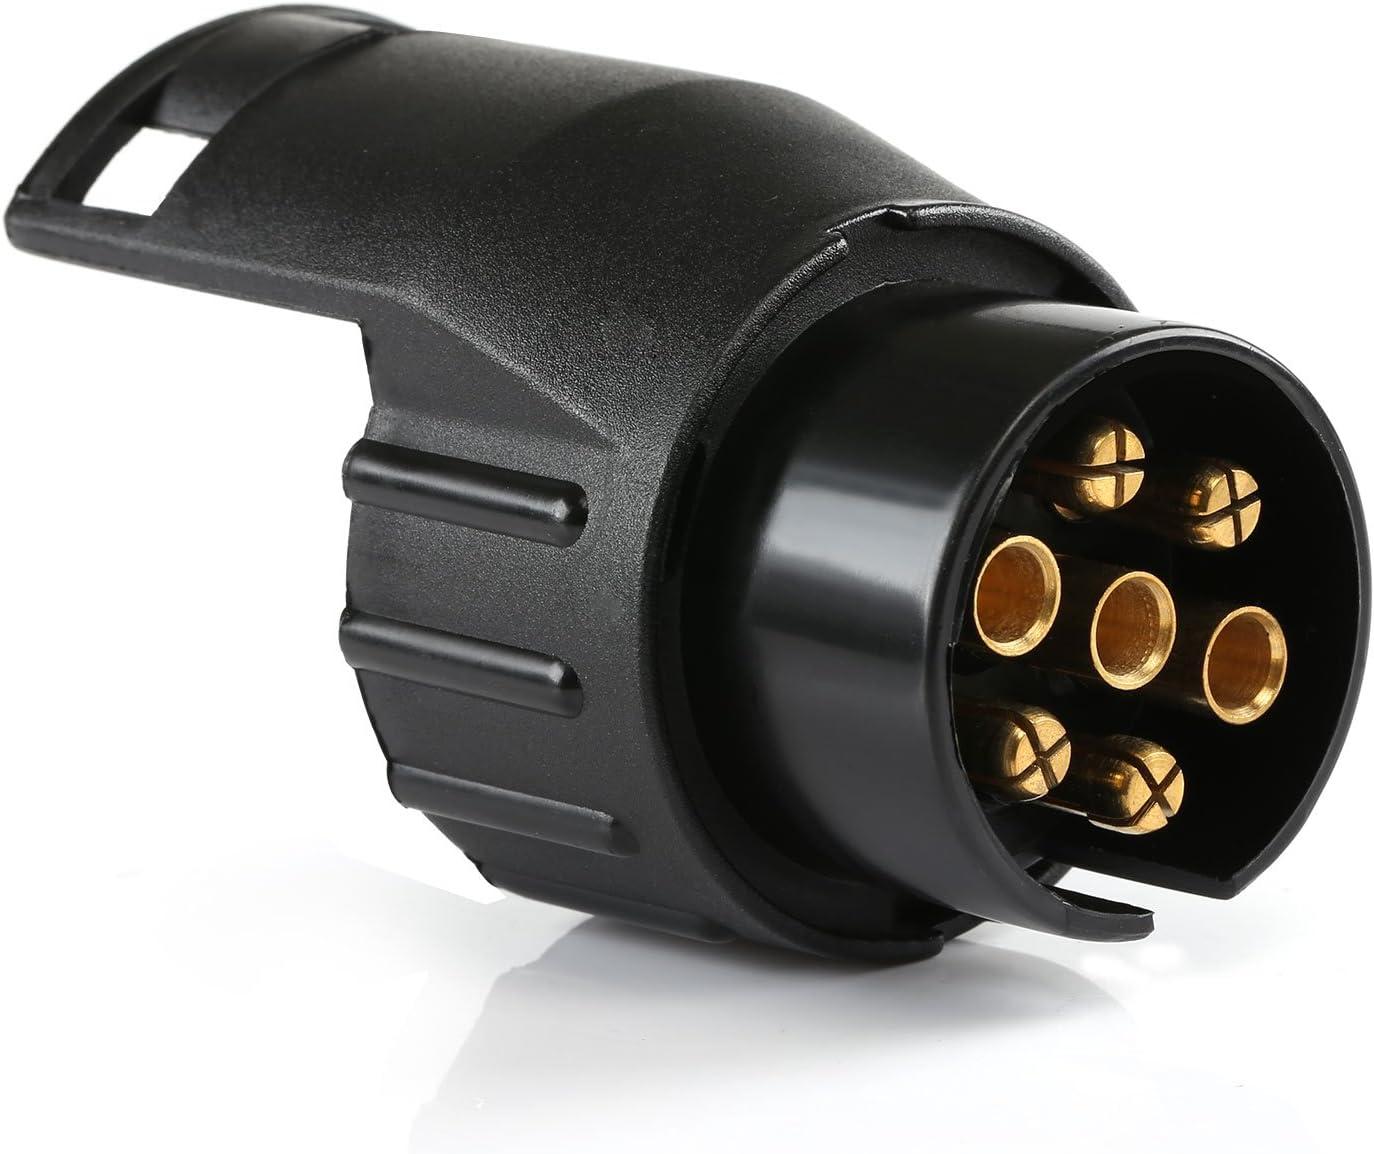 Truck Trailer Connector 5559011197 Electrical Adapter Converter LIHAO 1PCS 13-Pin to 7-Pin Round European Standard Socket Converter